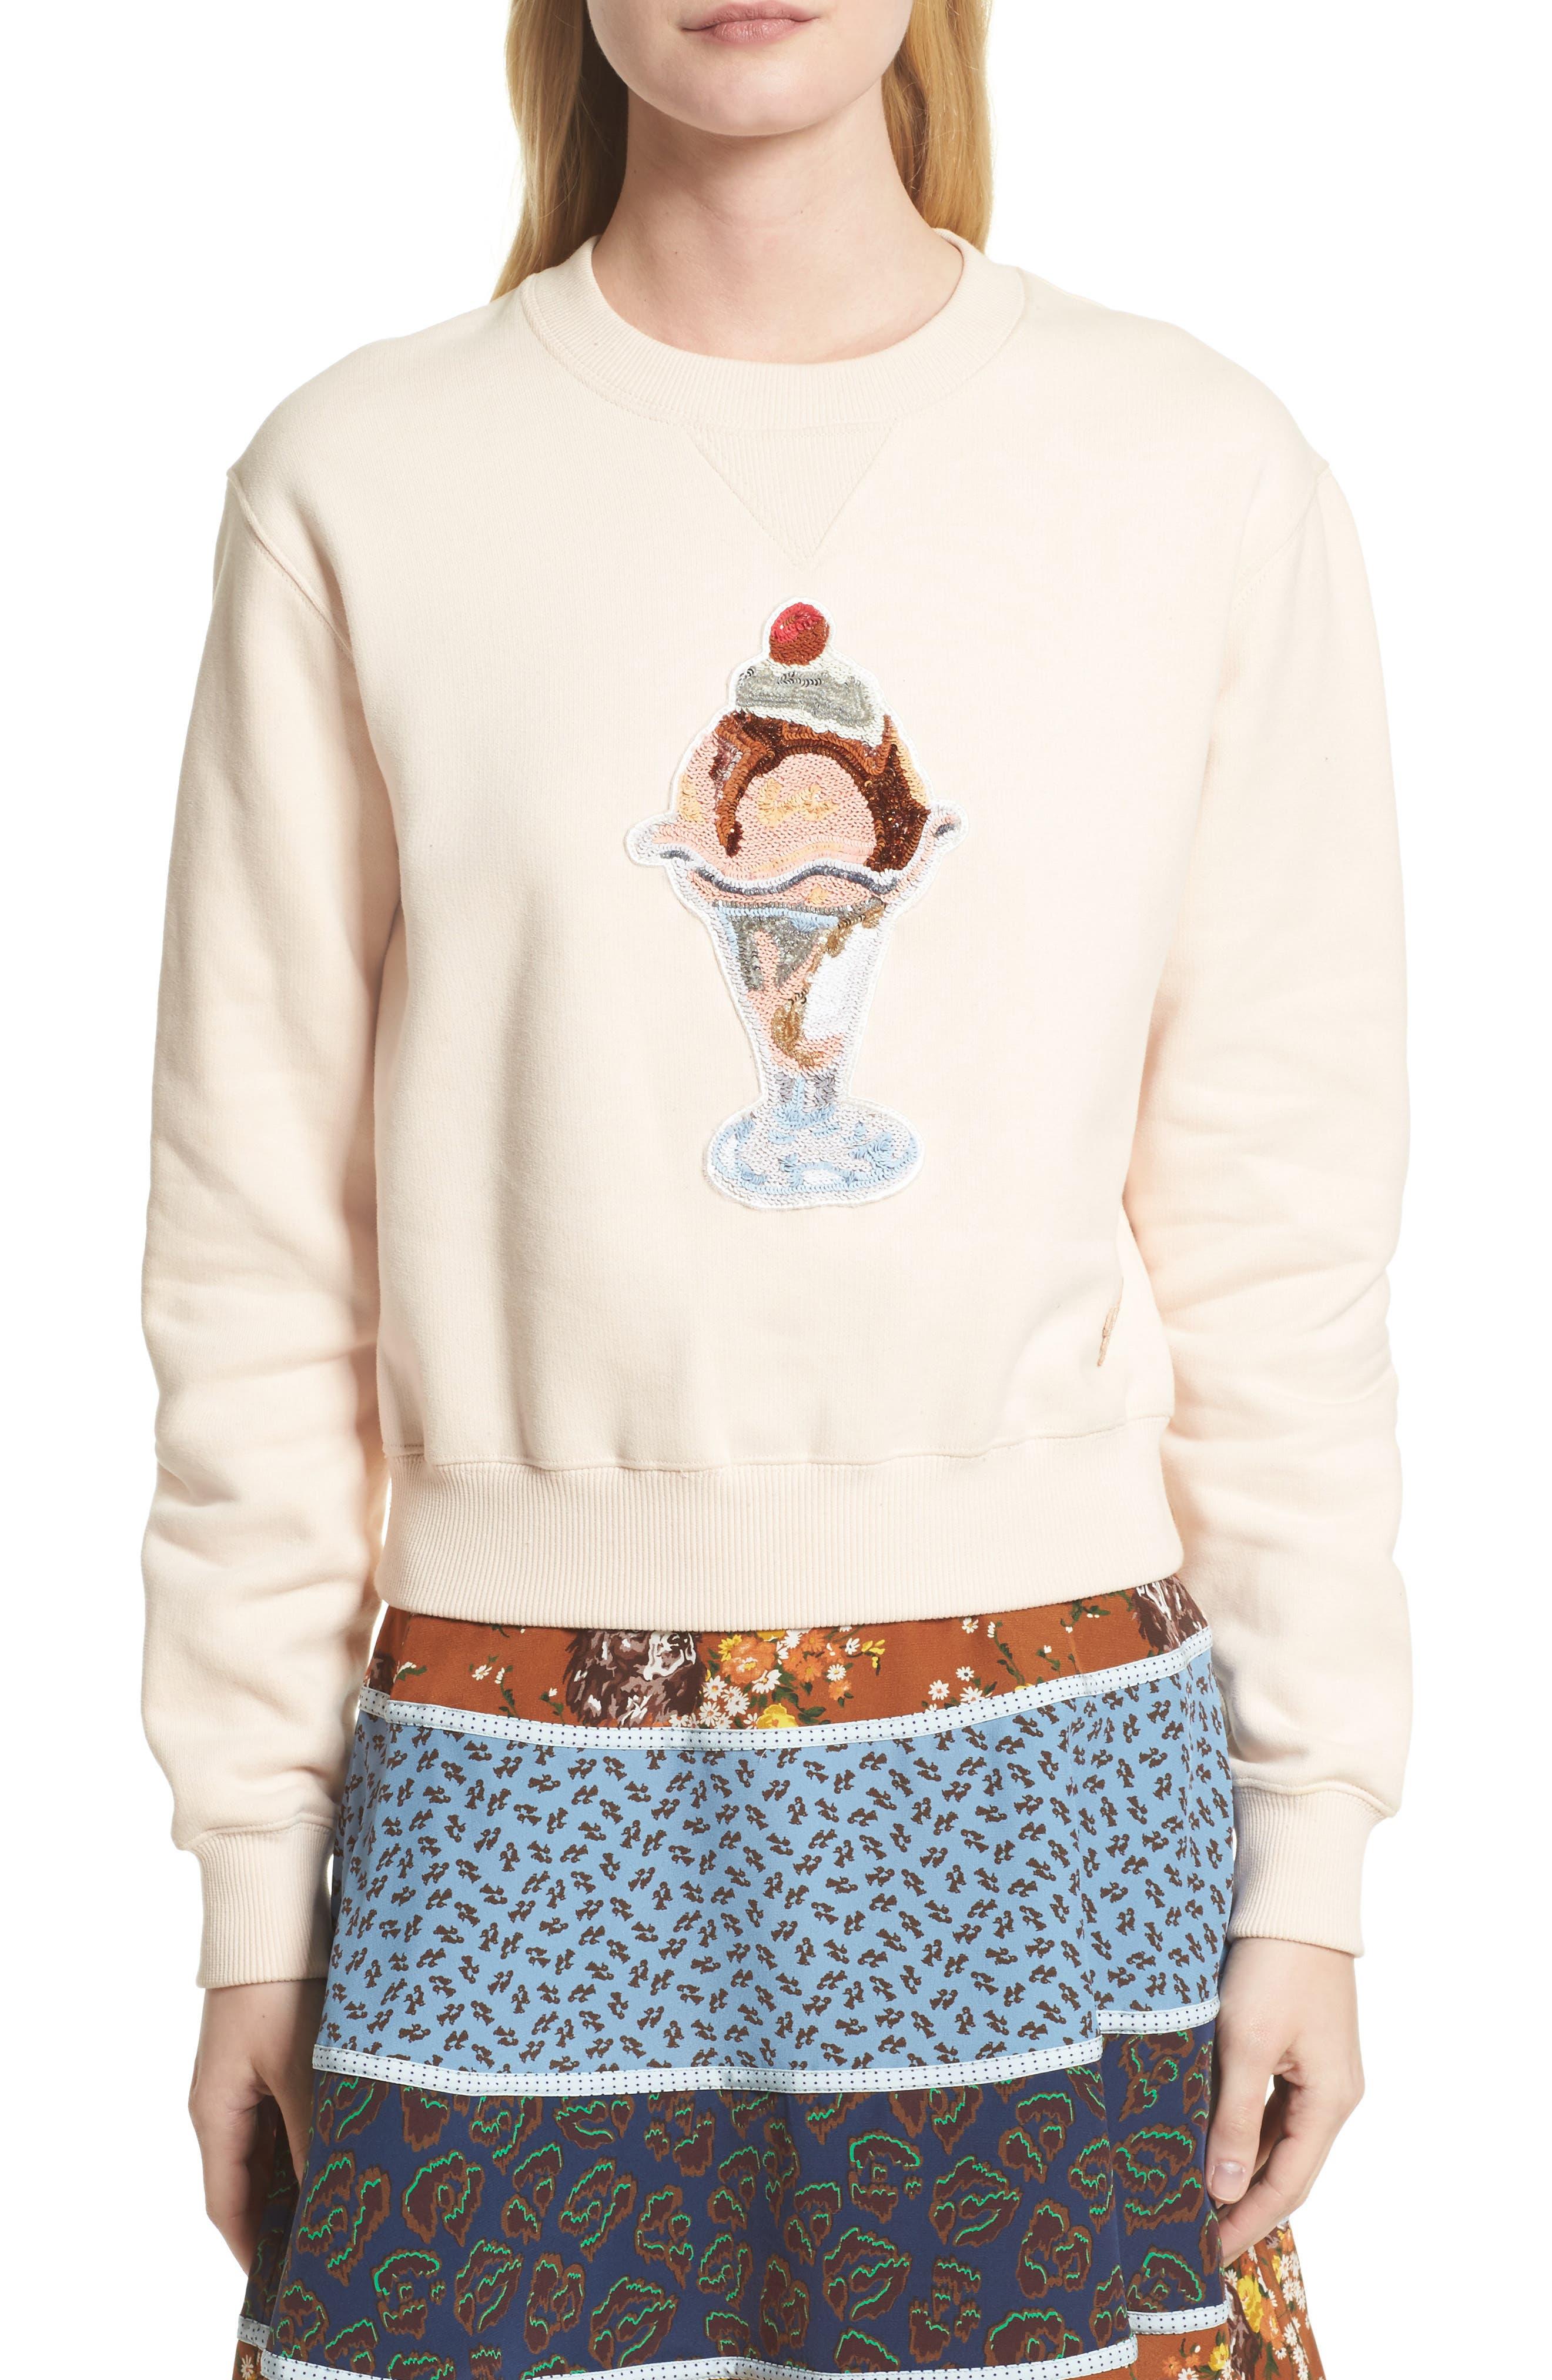 COACH 1941 Sequin Sundae Sweatshirt